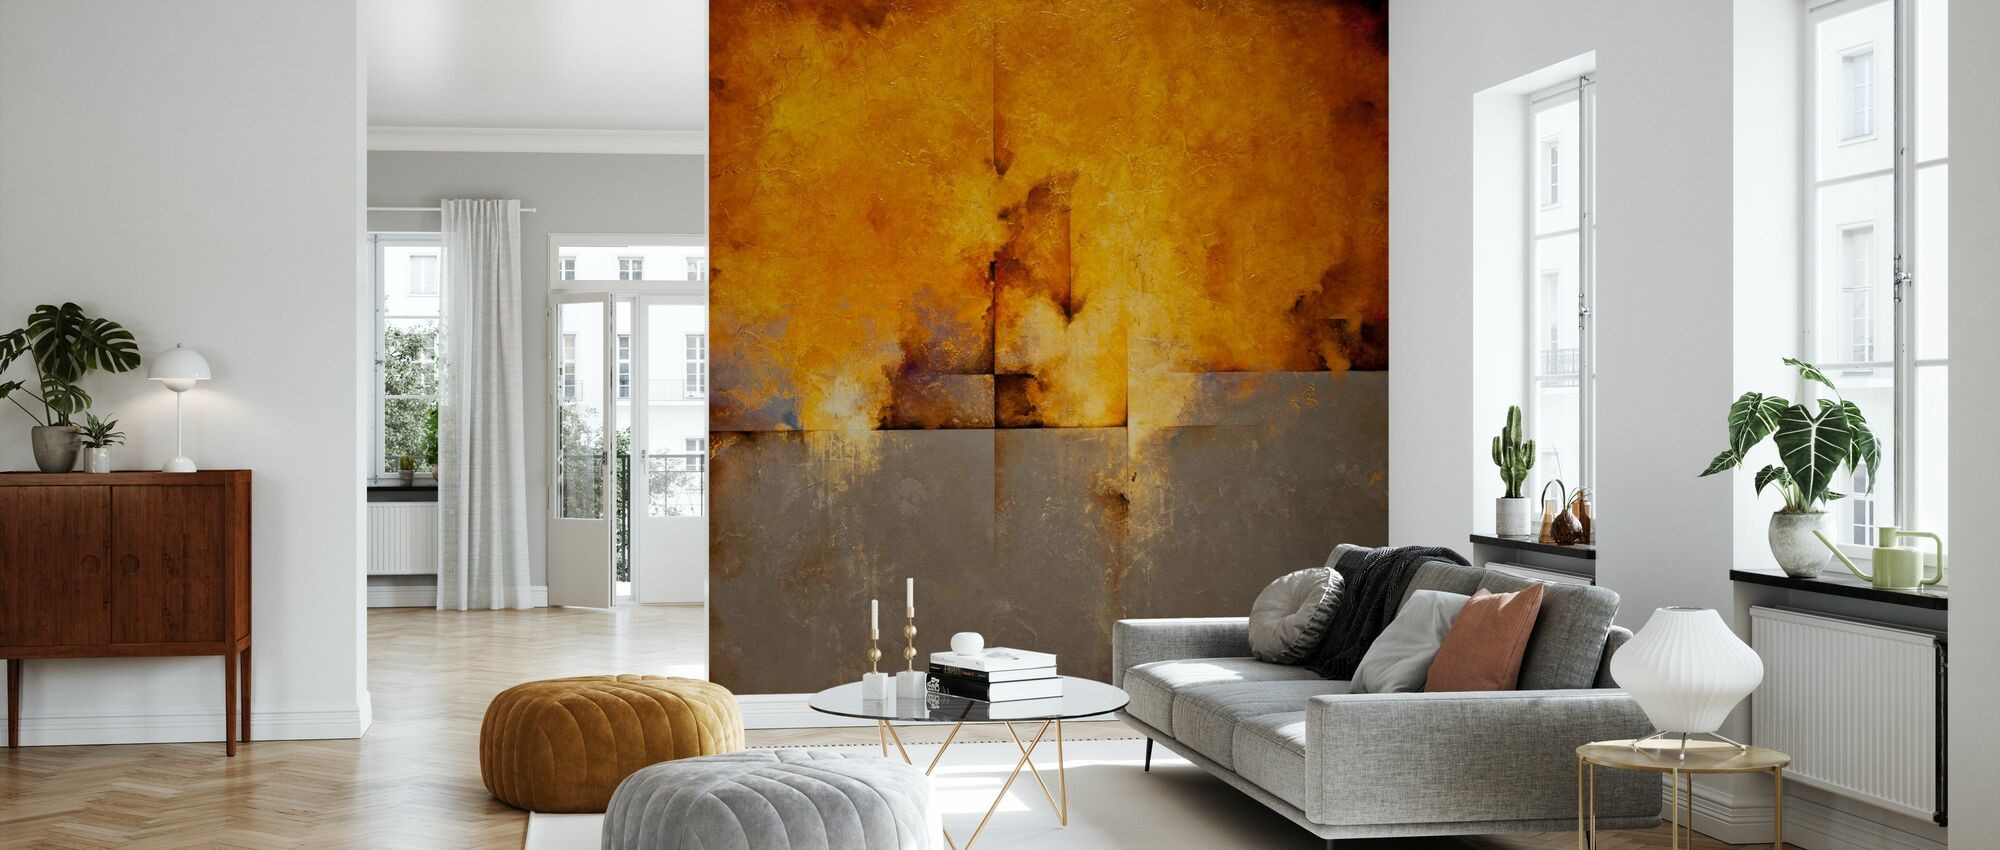 Lost Passage - Wallpaper - Living Room